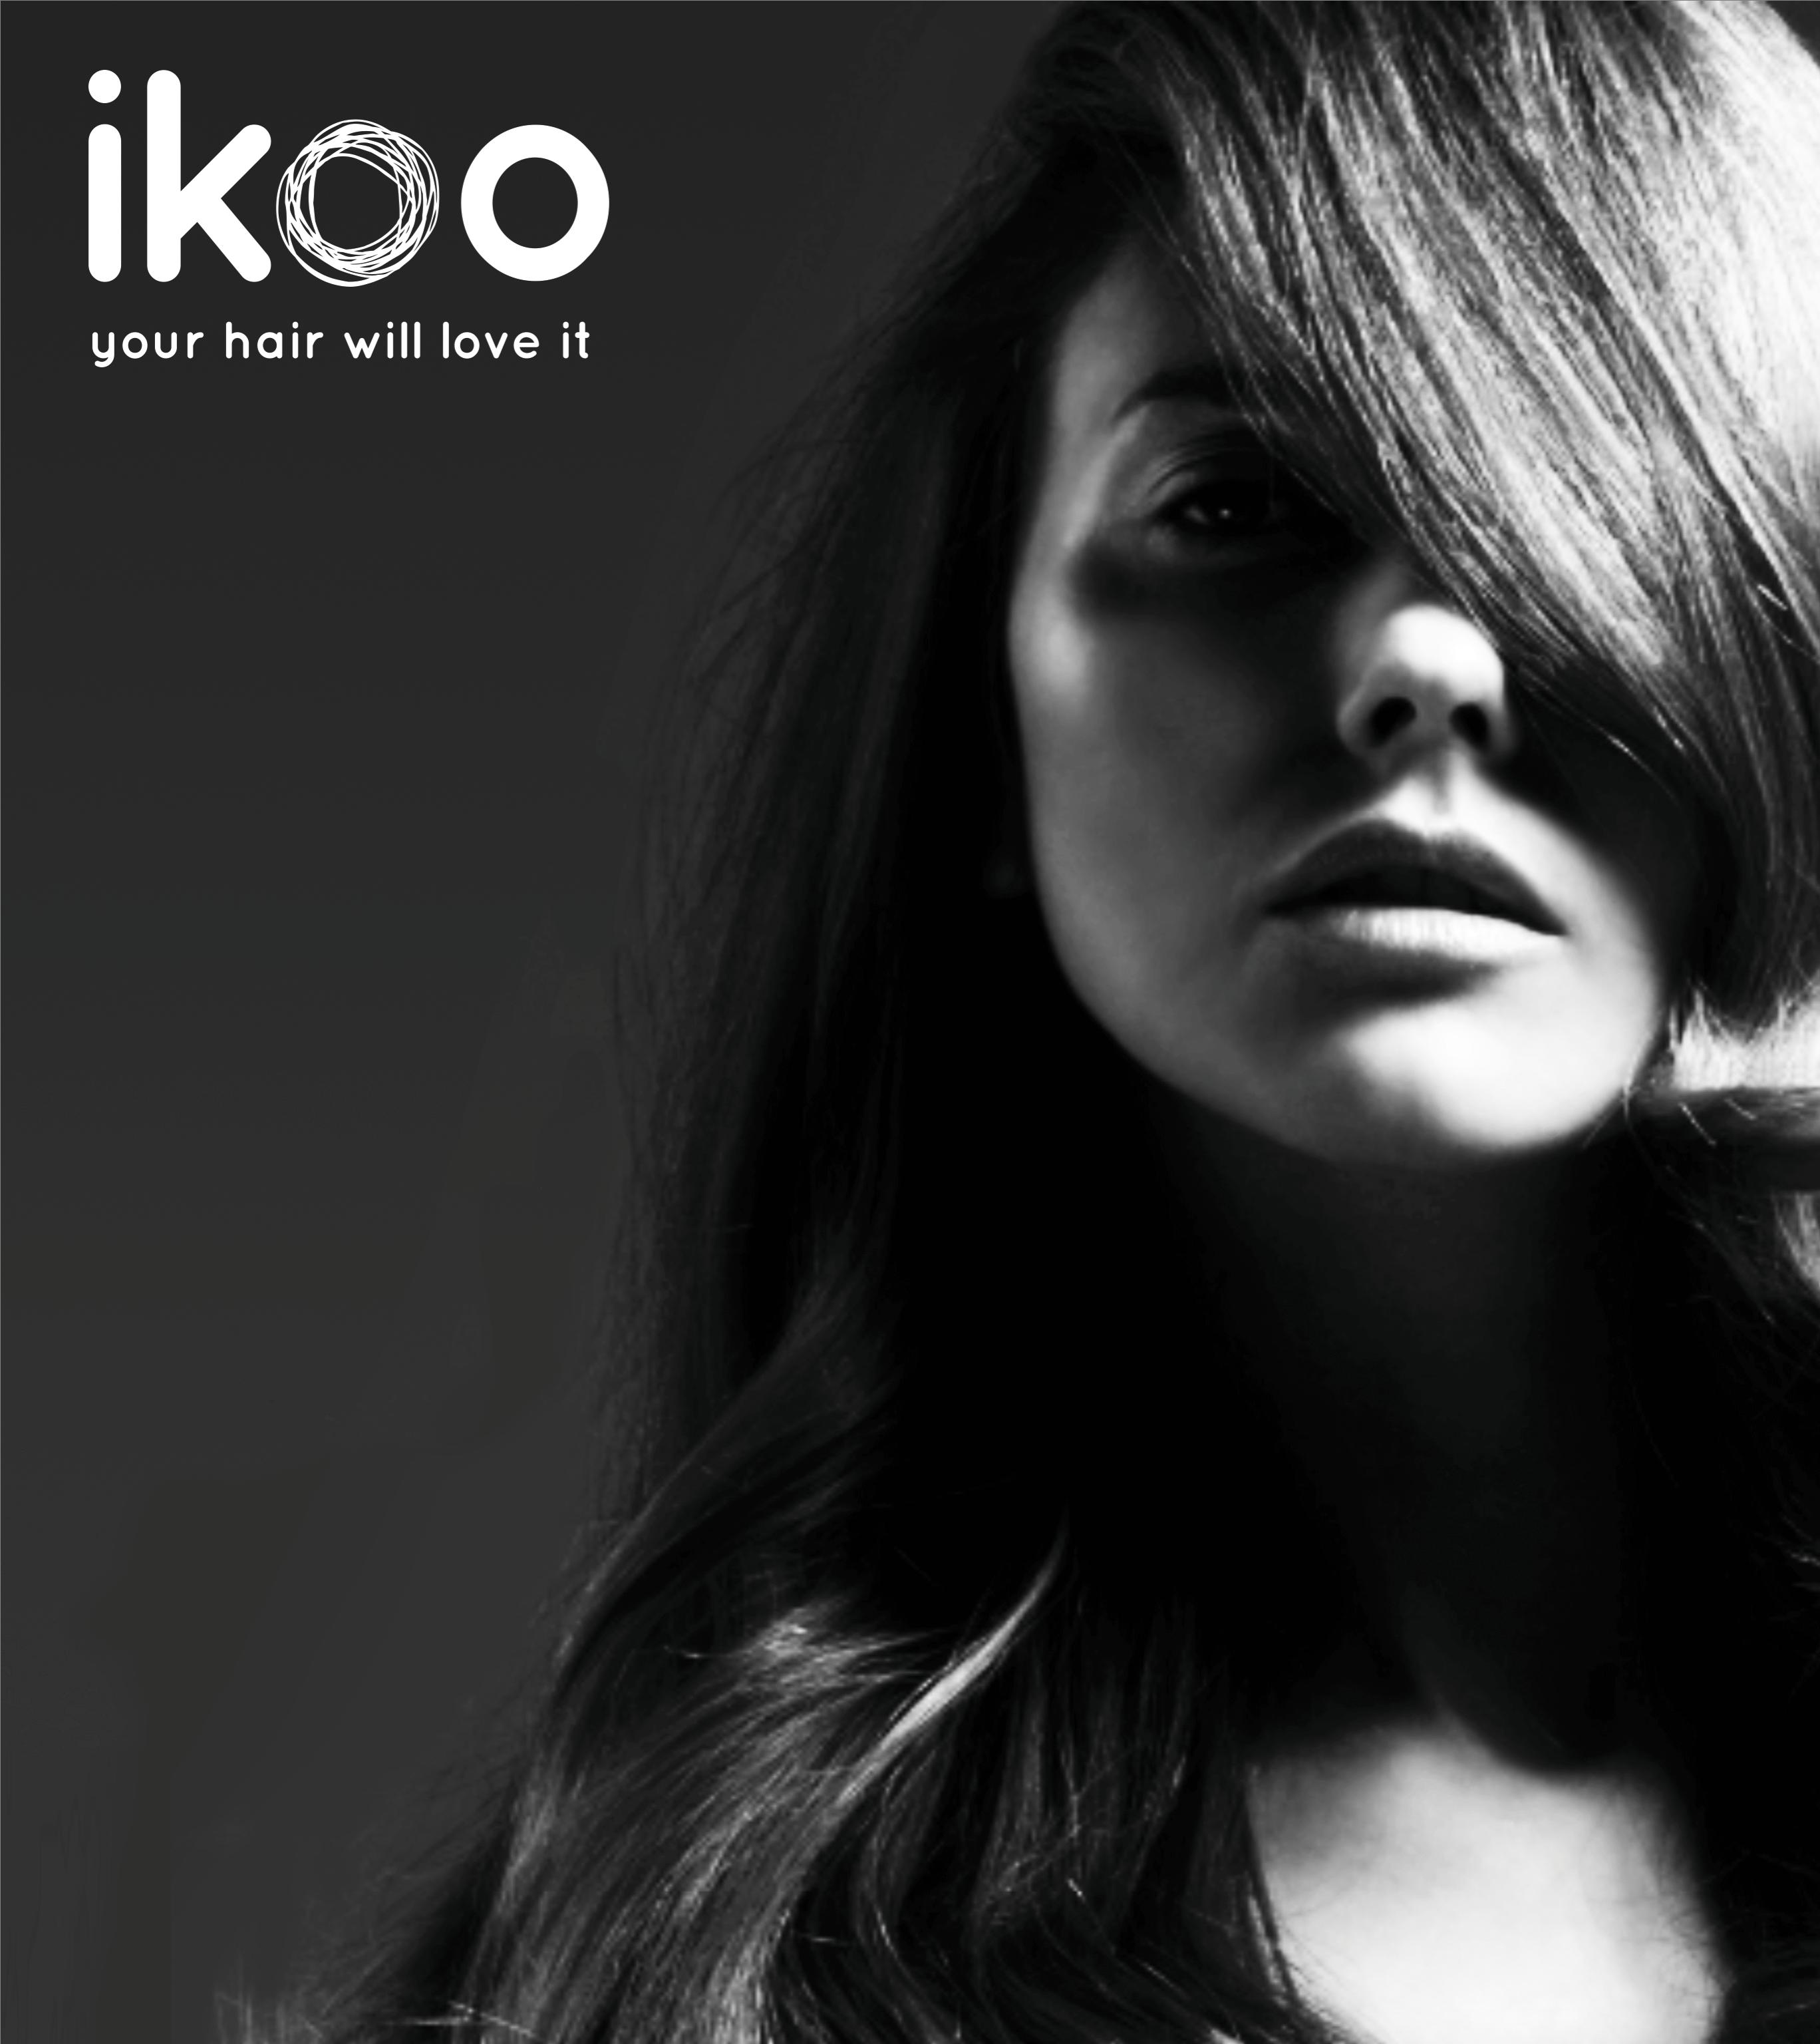 El cepillo masajeador #Ikoo @ikoobrush #cepillo #brush #beauty #hair